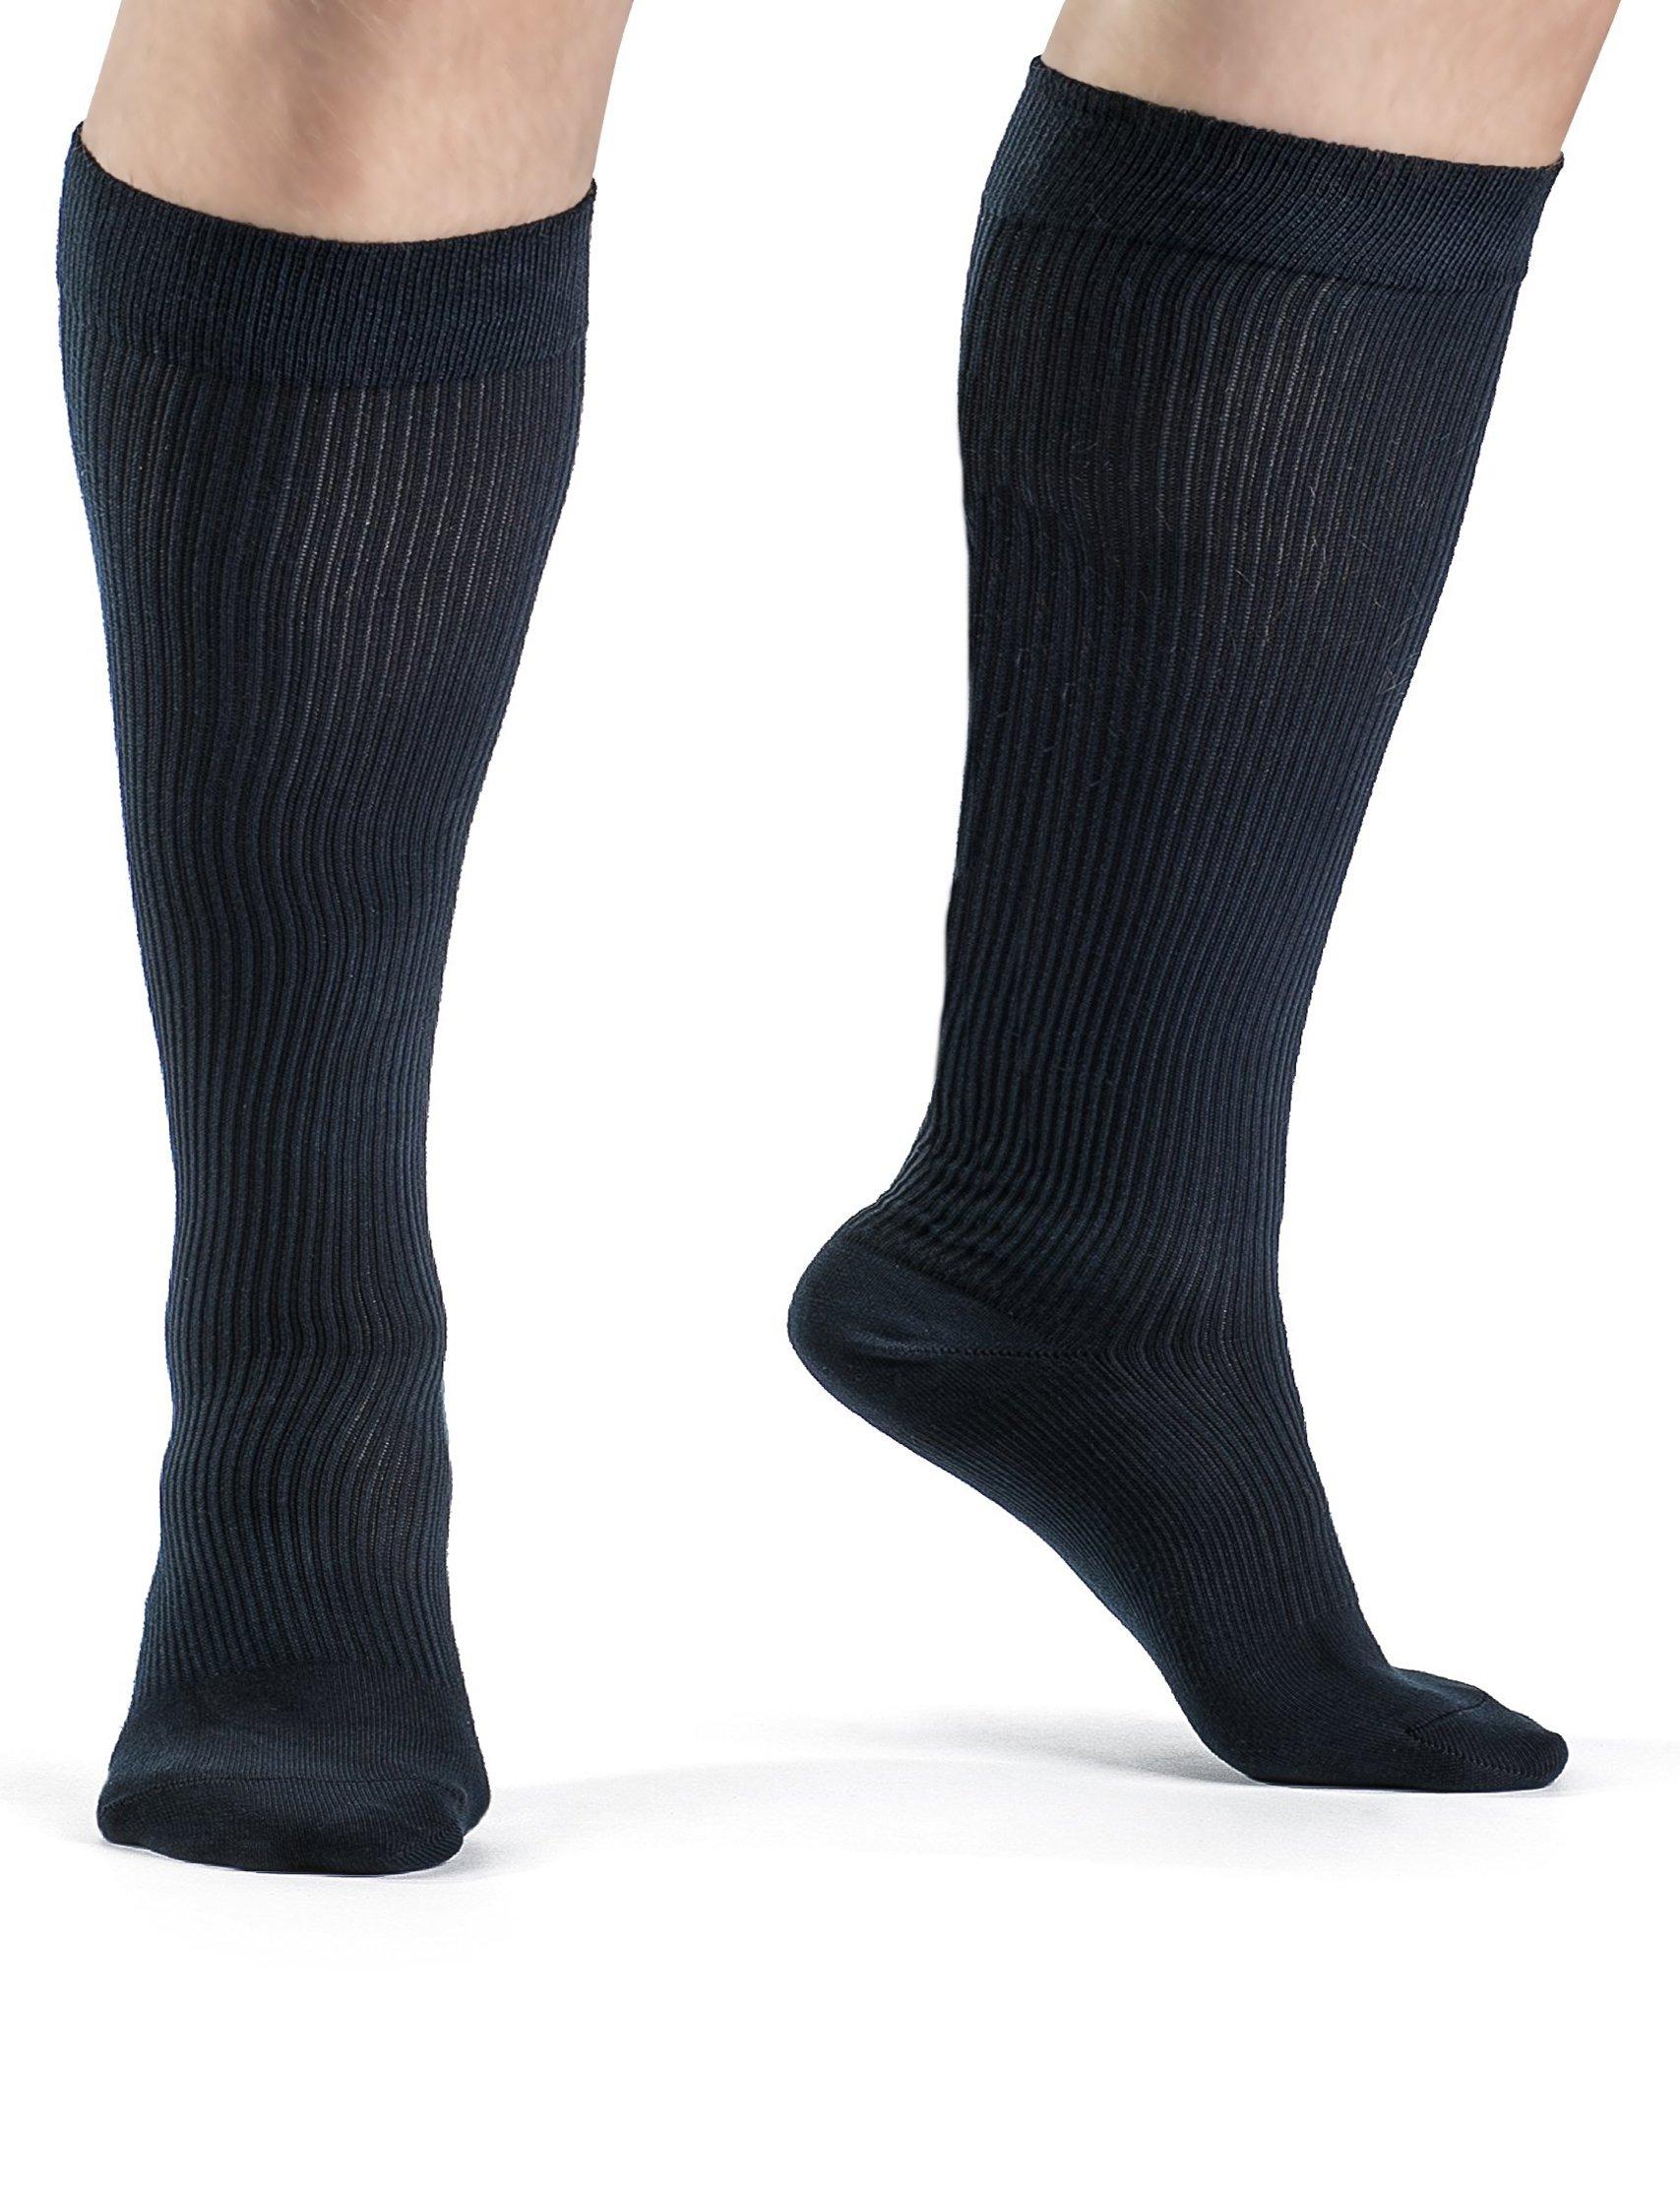 Medical Grade Plus Size Wide Calf and Ankle Gradient Compression 20-30 mmHg Unisex Organic Cotton Compression Socks,Premium Hosiery for Maternity, Travel, Athletes, Sports, Diabetics. (XXXL)